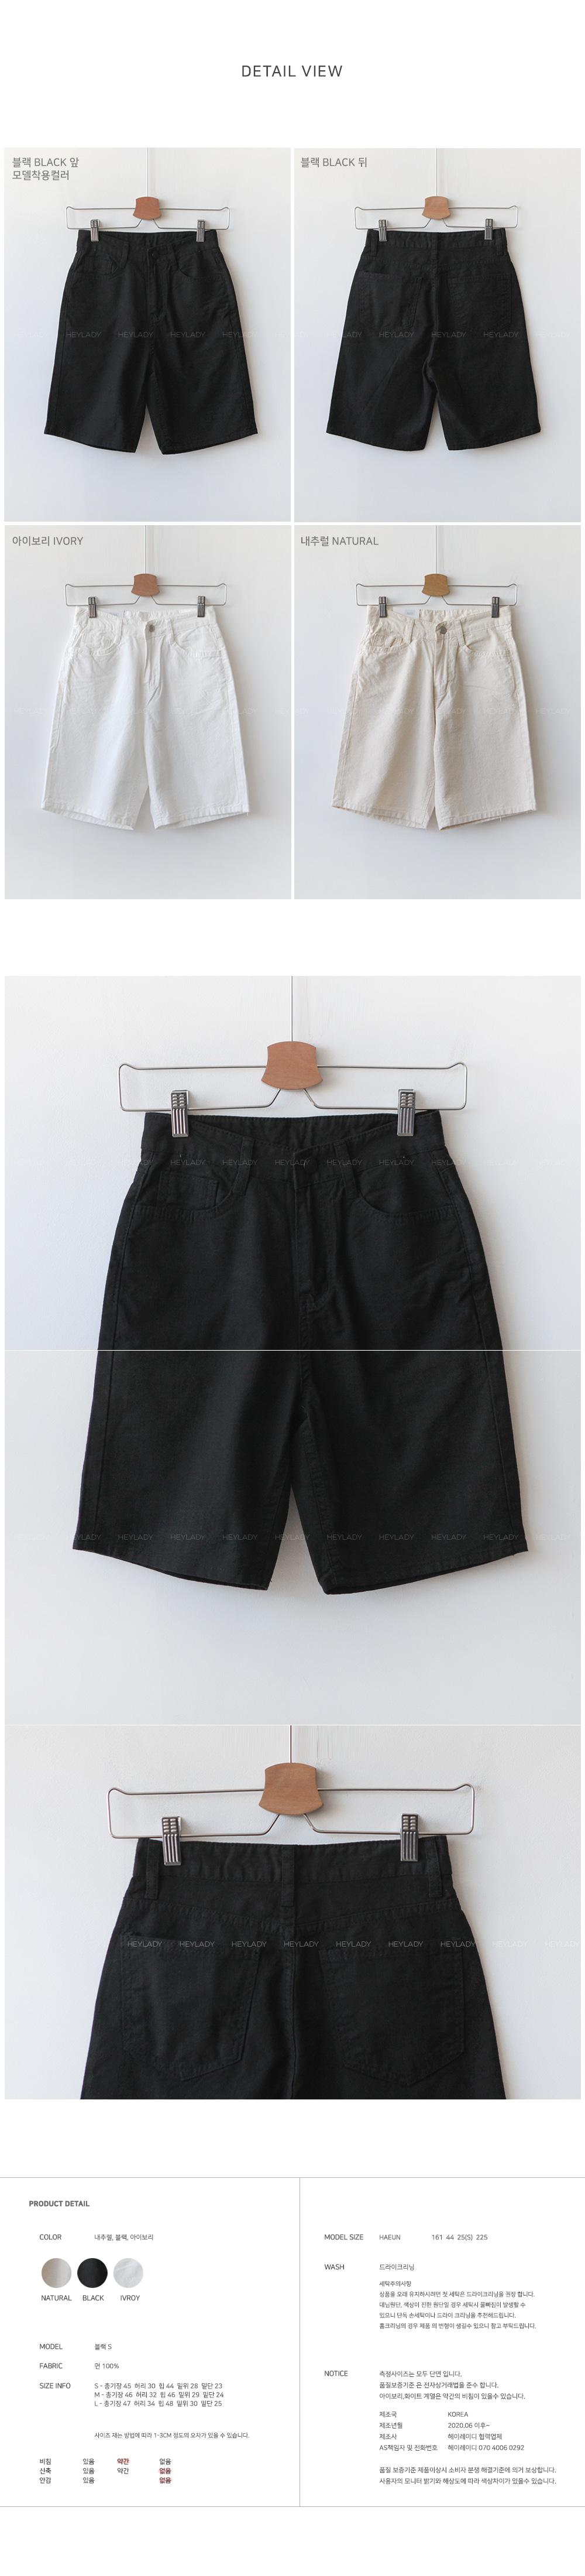 My Time Cotton Short Pants